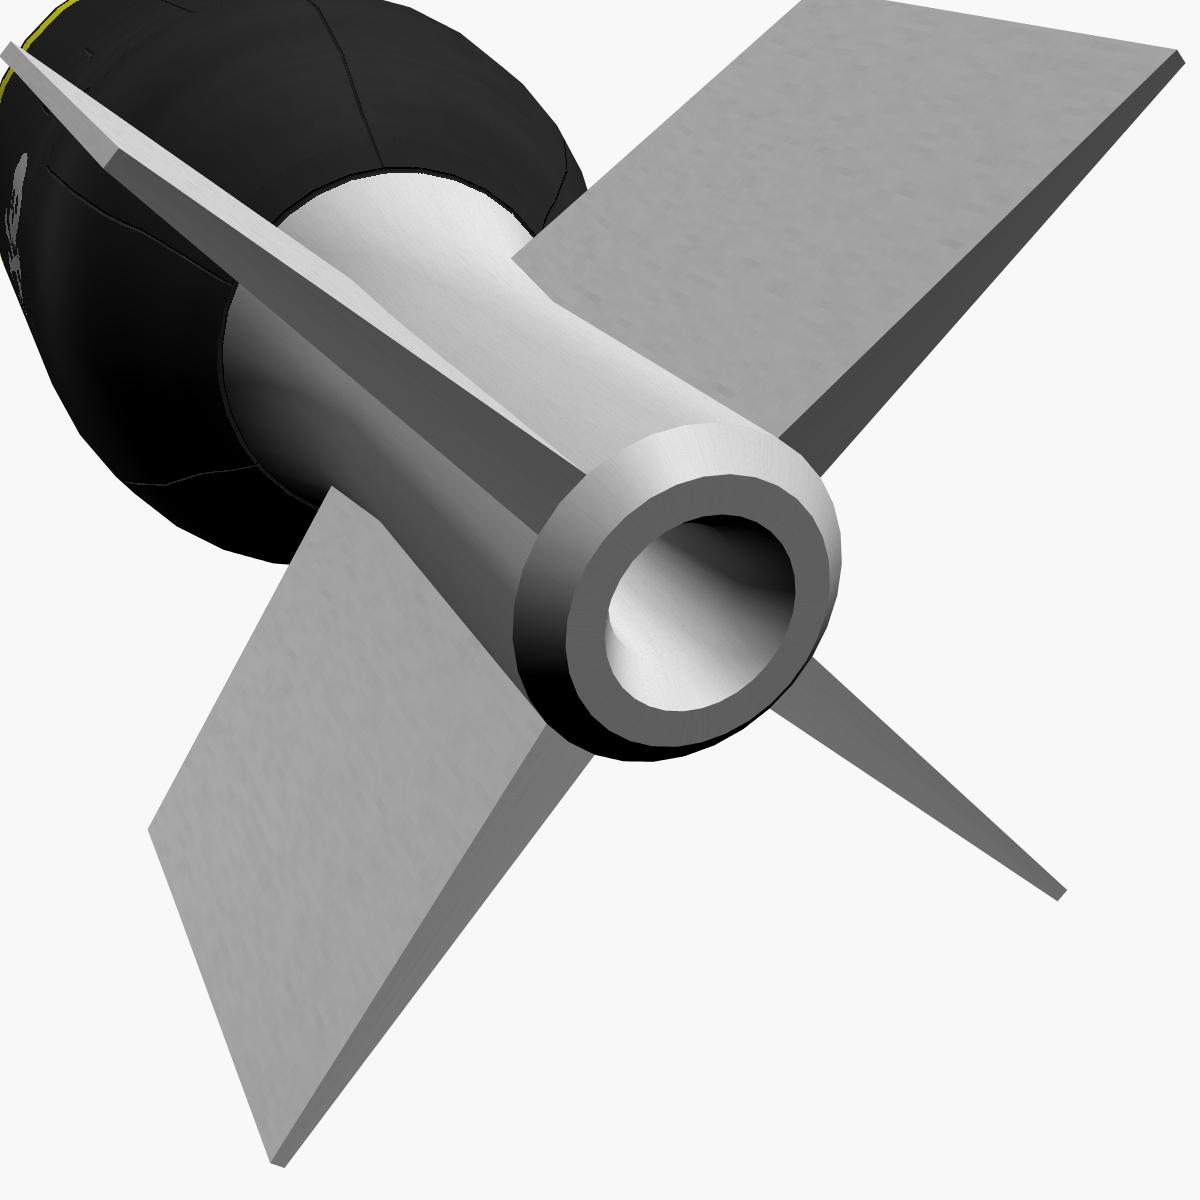 Bomb, Jolly Roger scheme 3d model 3ds dxf fbx blend cob dae X obj 162674